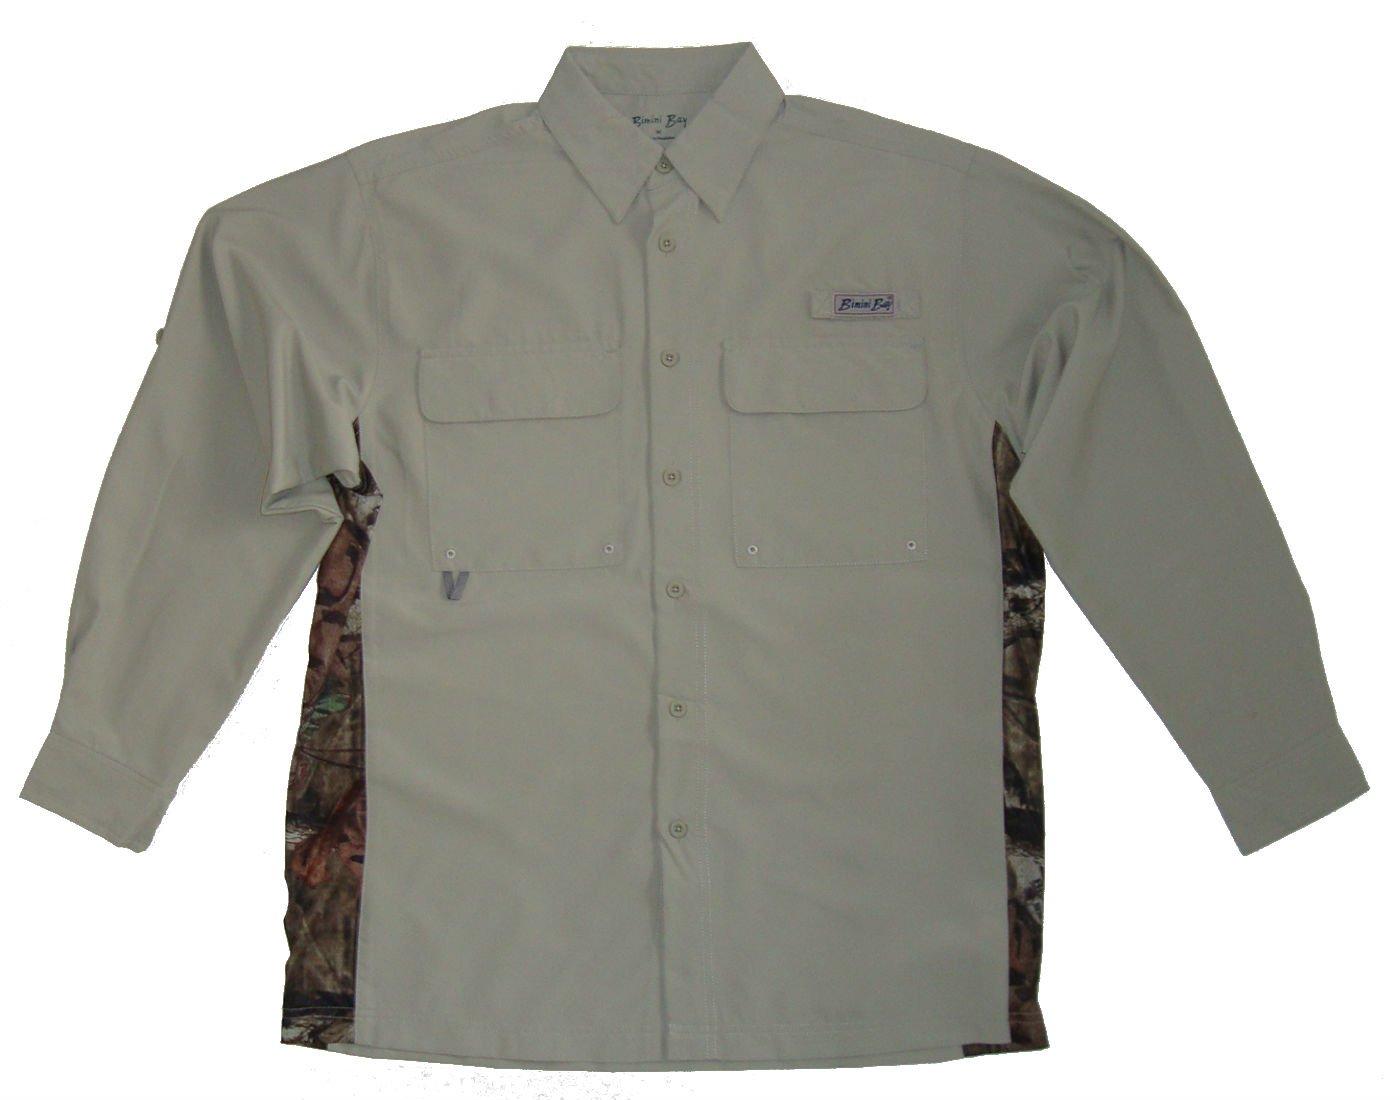 Bimini Bay Outfitters Gulf Stream w/ Camo Side Panels Long Sleeve Shirt by Bimini Bay Outfitters